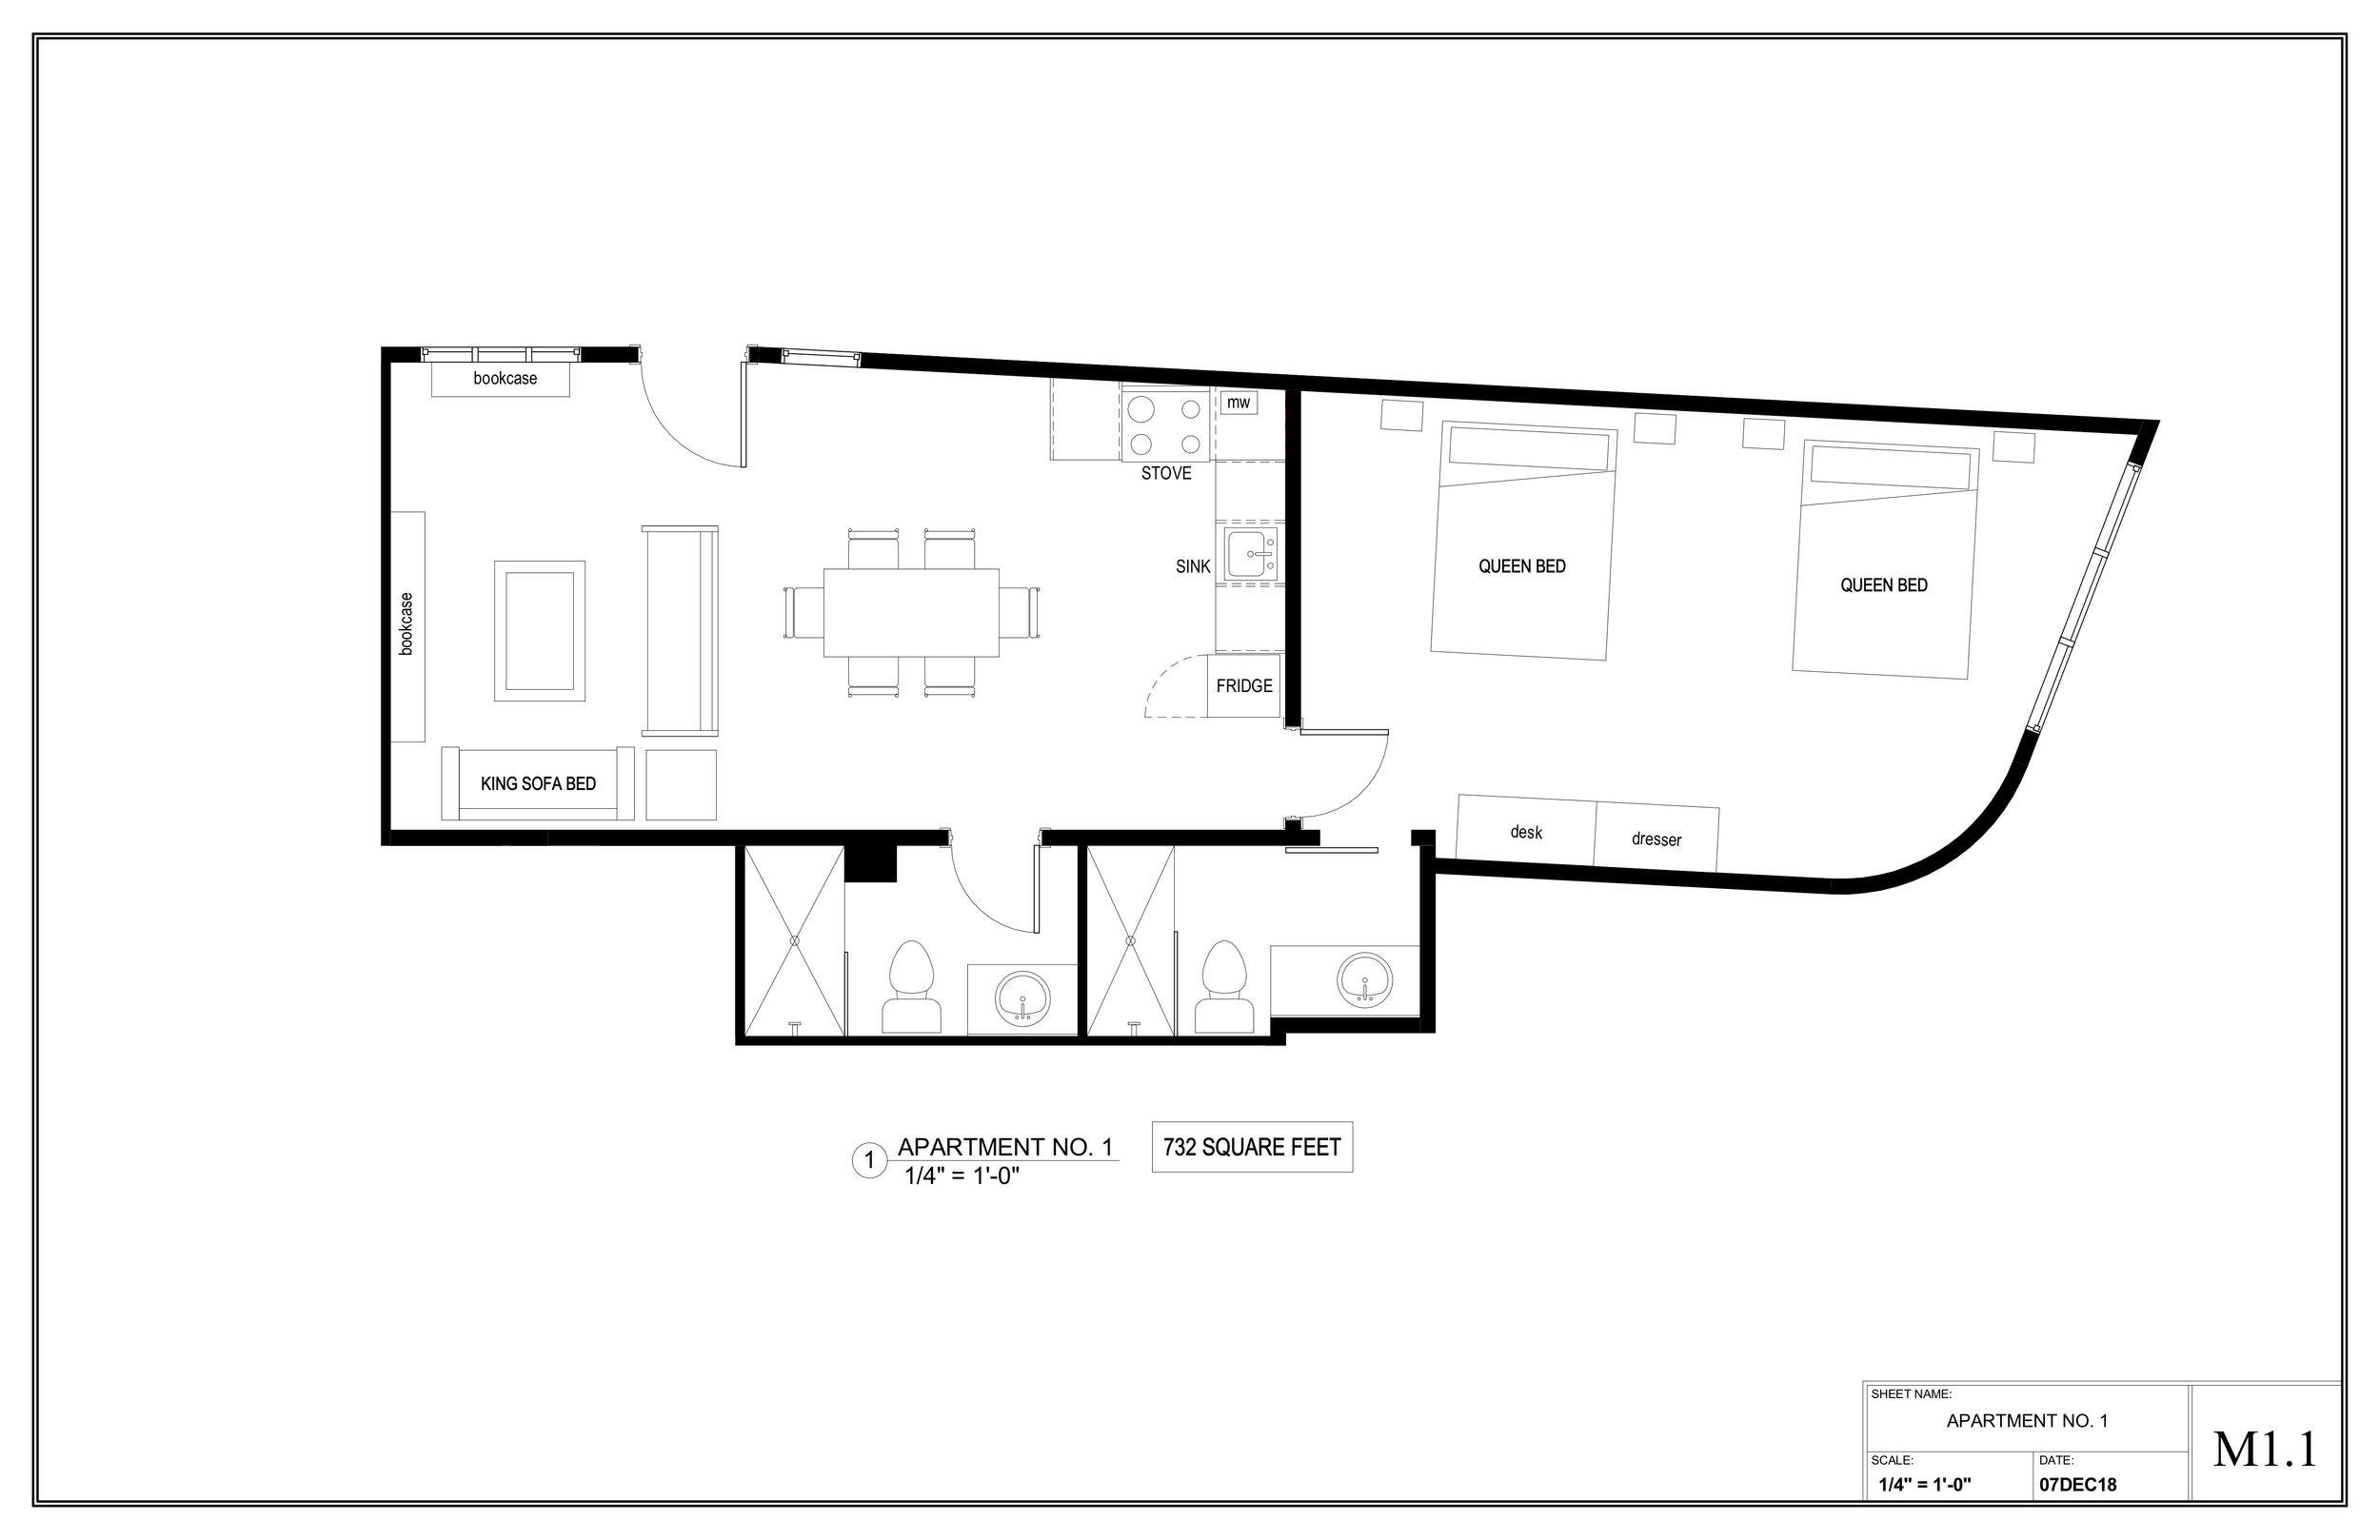 Apartment #1.jpg